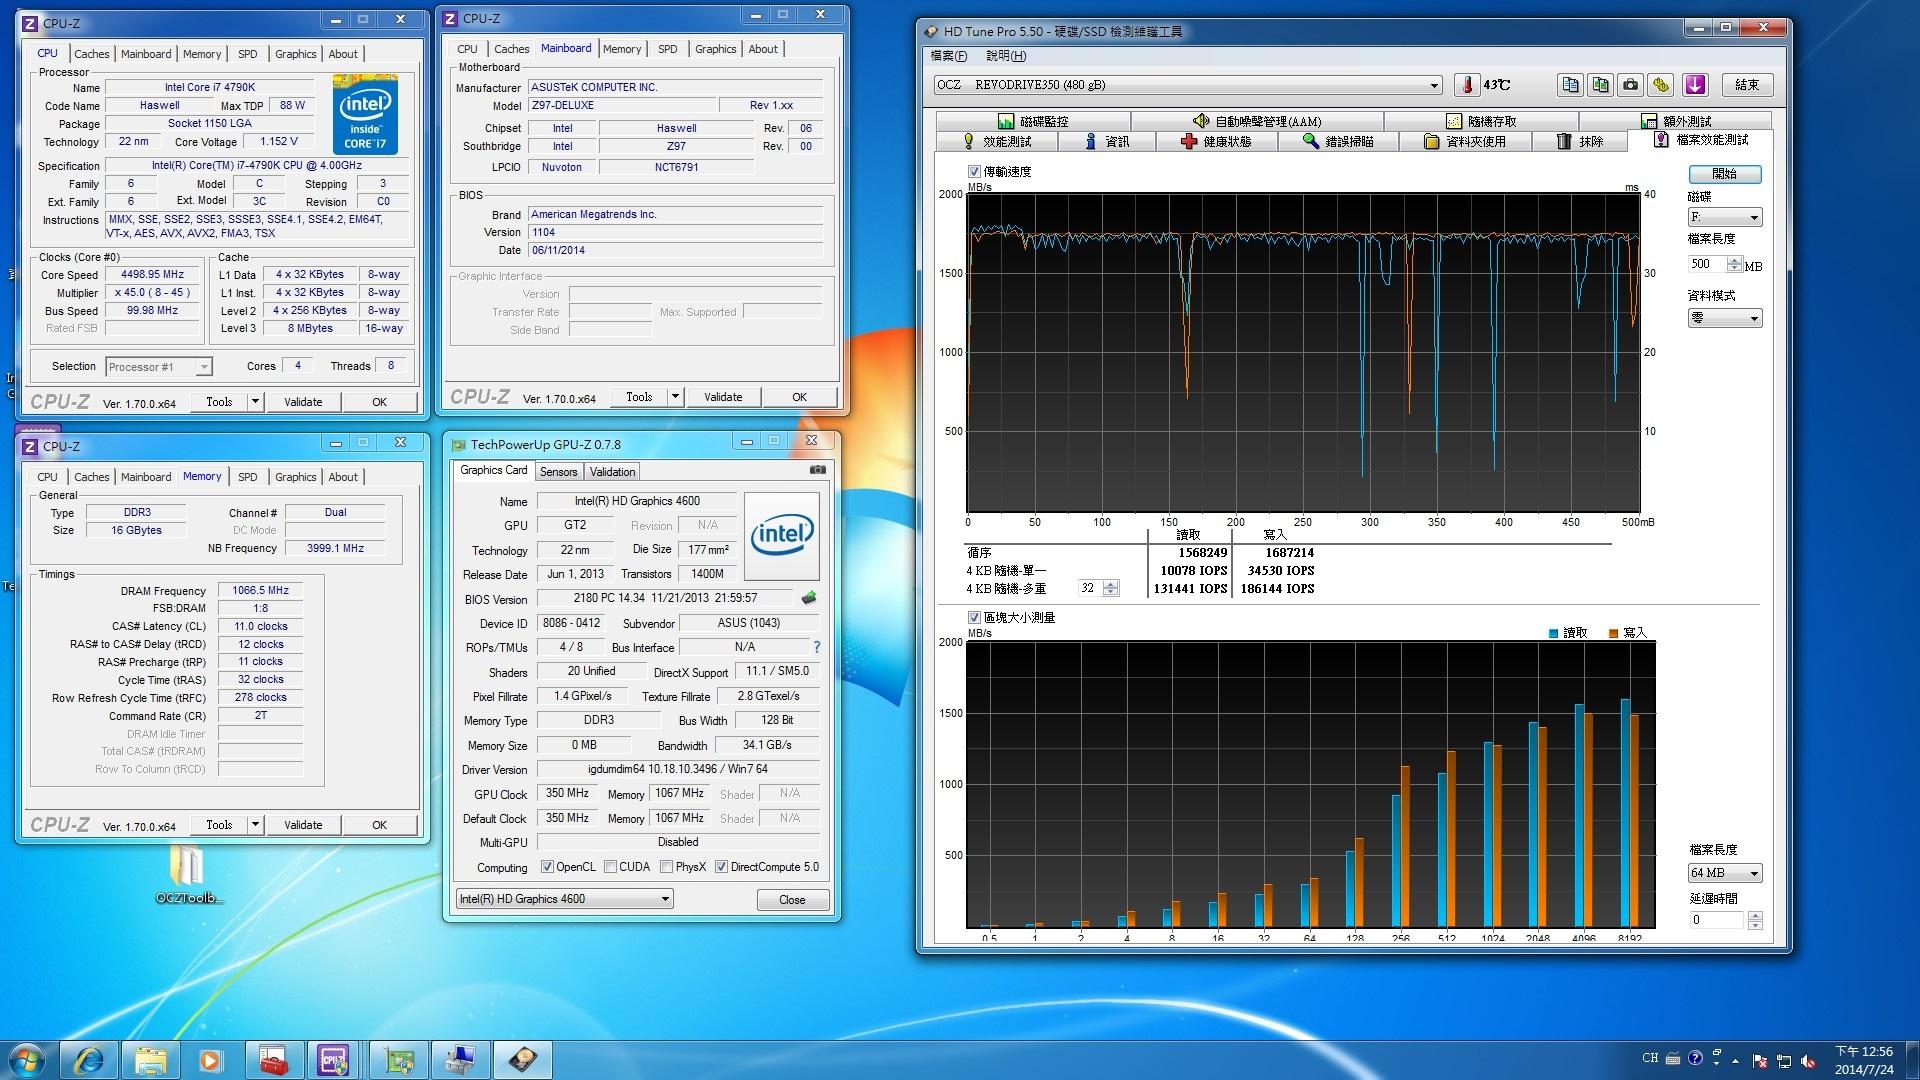 [XF] 速度破千,事半功倍,OCZ RevoDrive 350 PCI Express SSD 480GB開箱評測(含雙卡RAID測試)